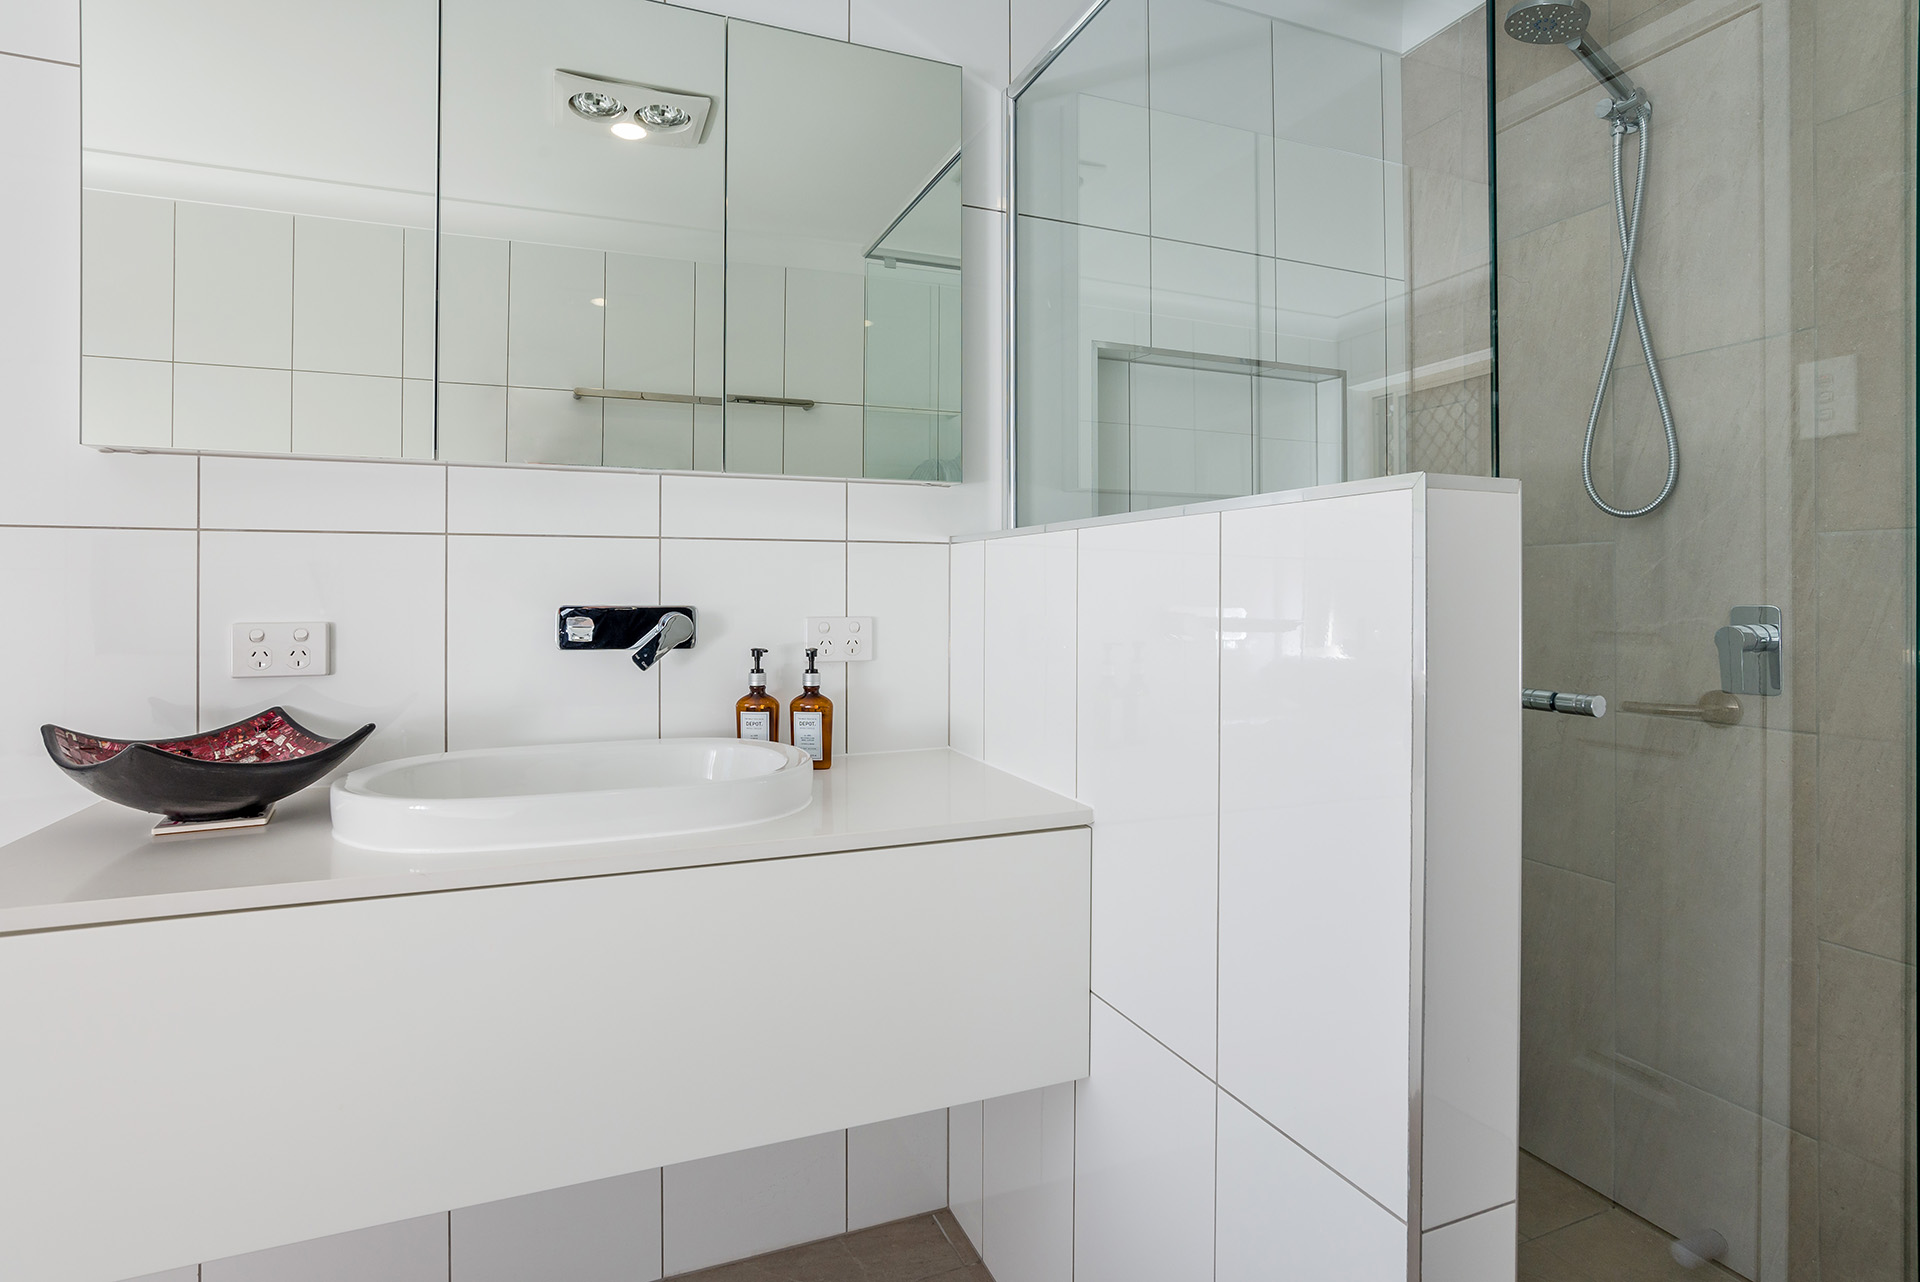 river city constructions bathroom white tiles renovation